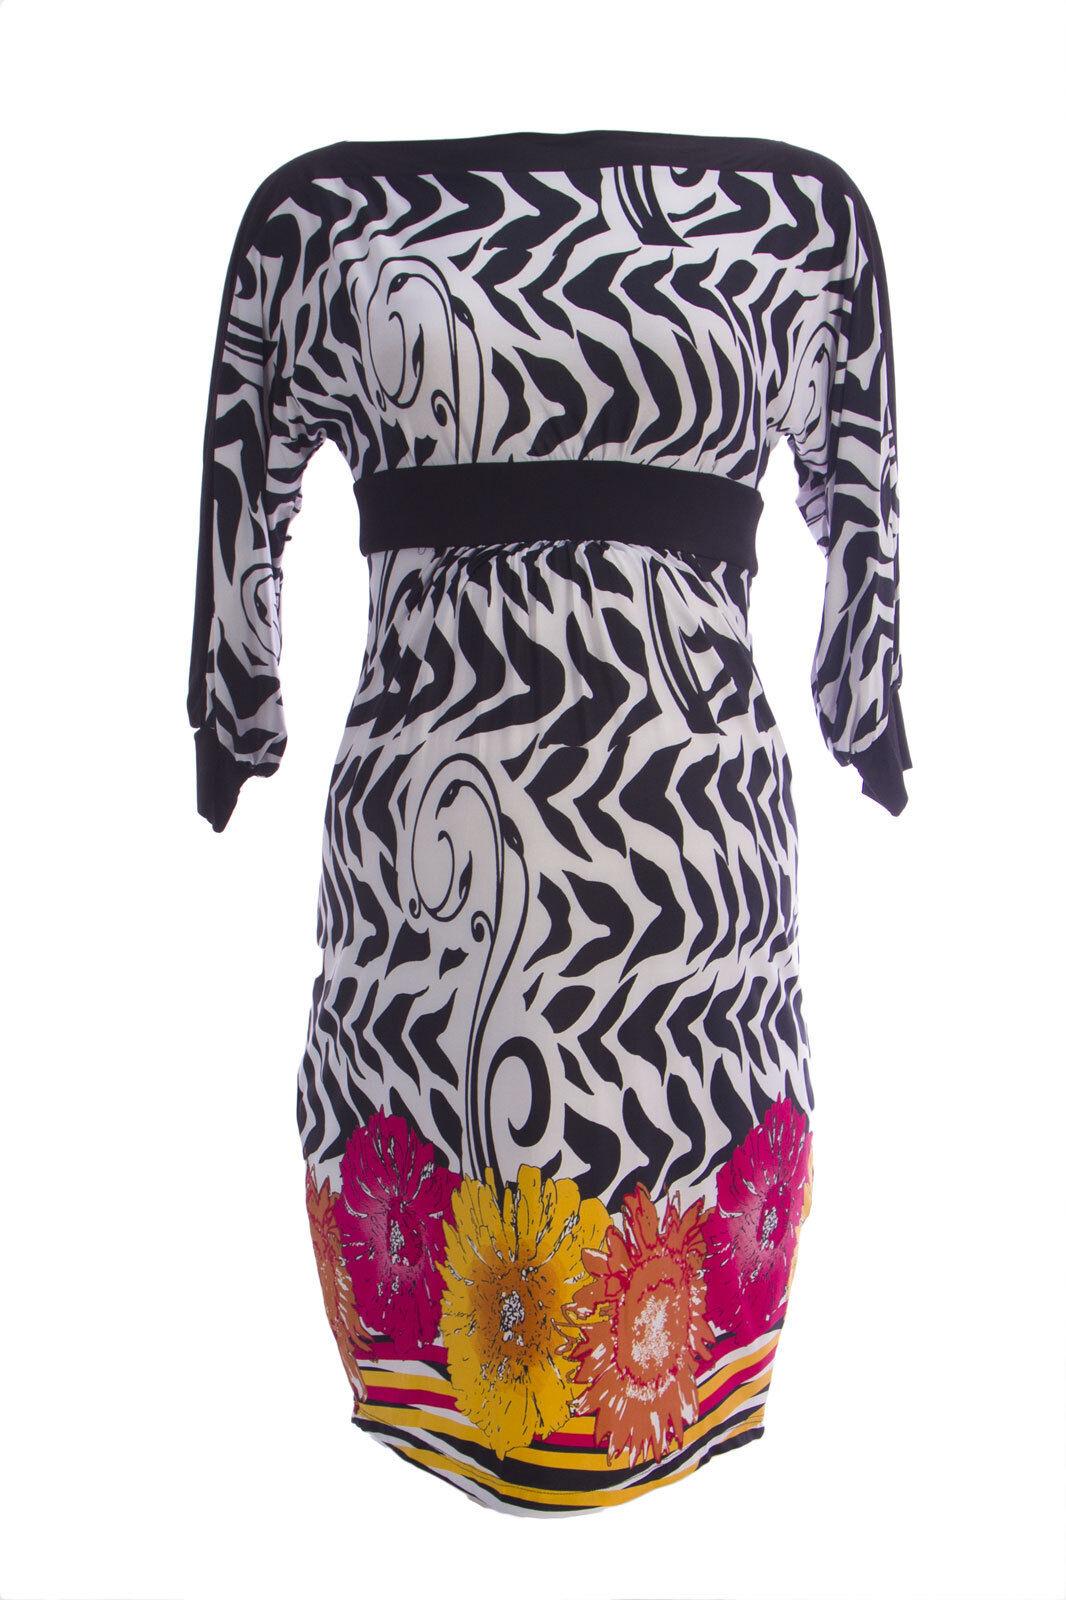 OLIAN Maternity Women's Multi Floral Print 3 4 Blouson Sleeve Dress  148 NWT